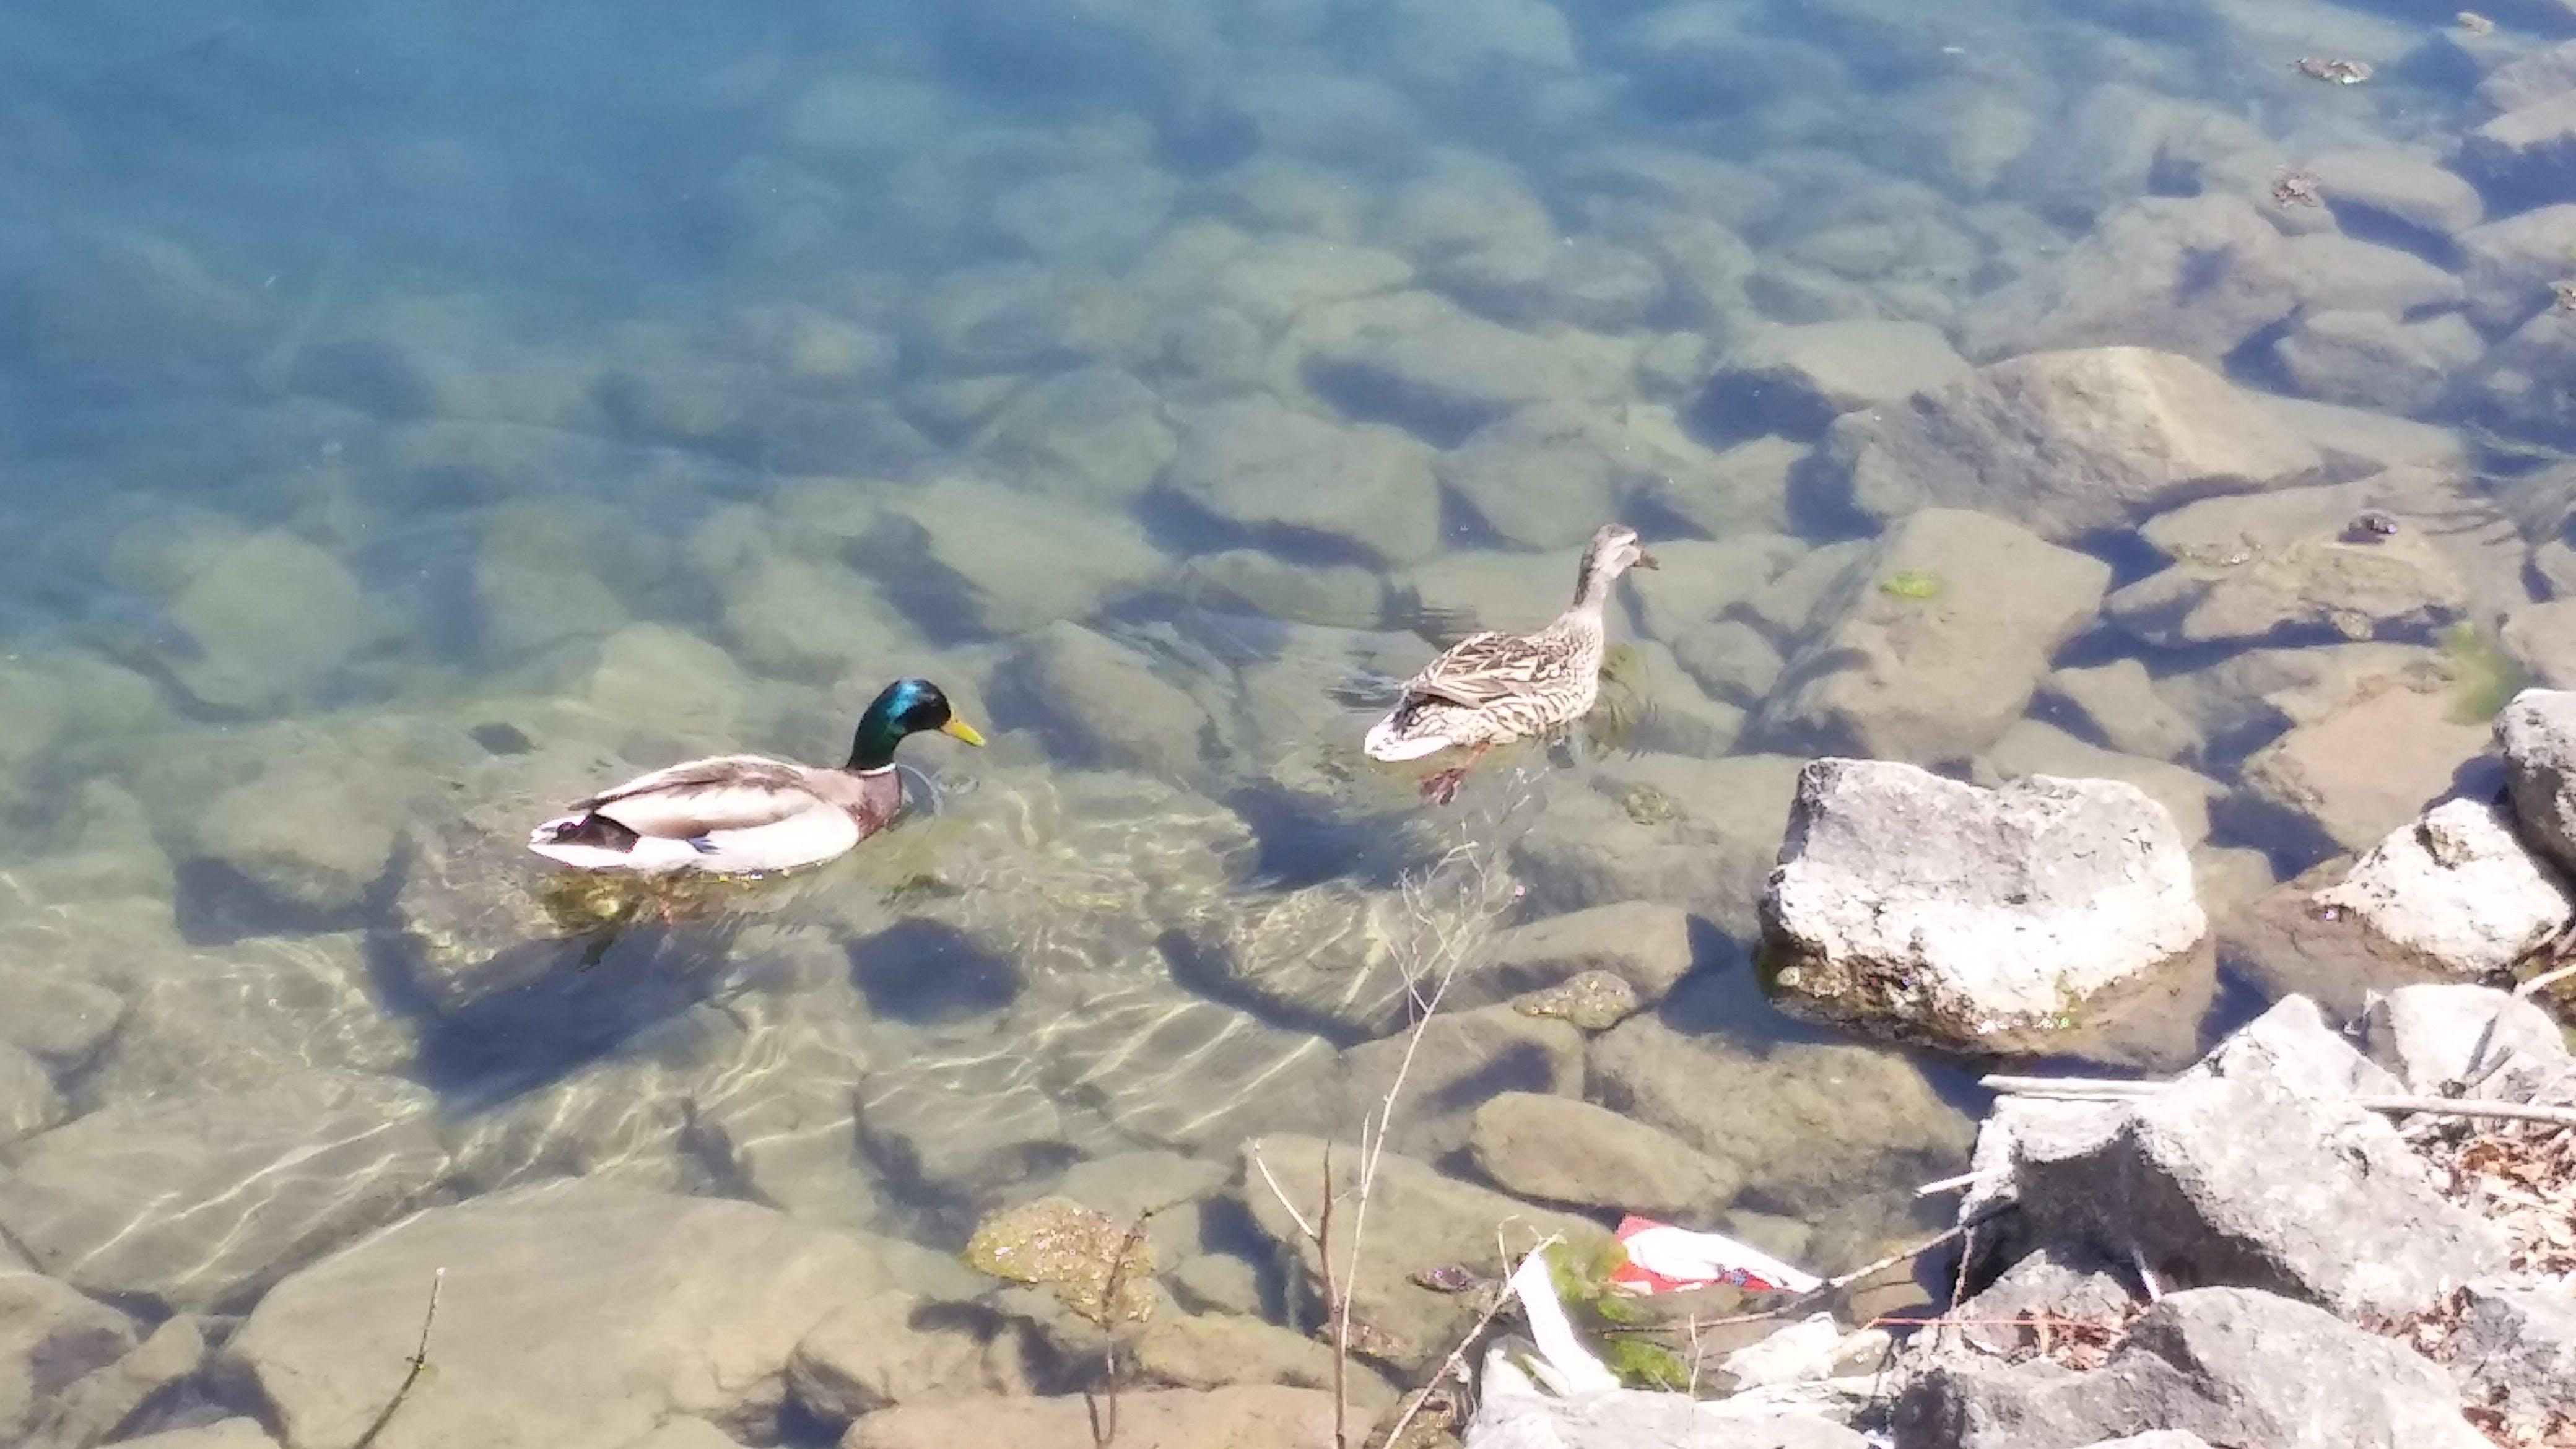 Free stock photo of ducks, rocks